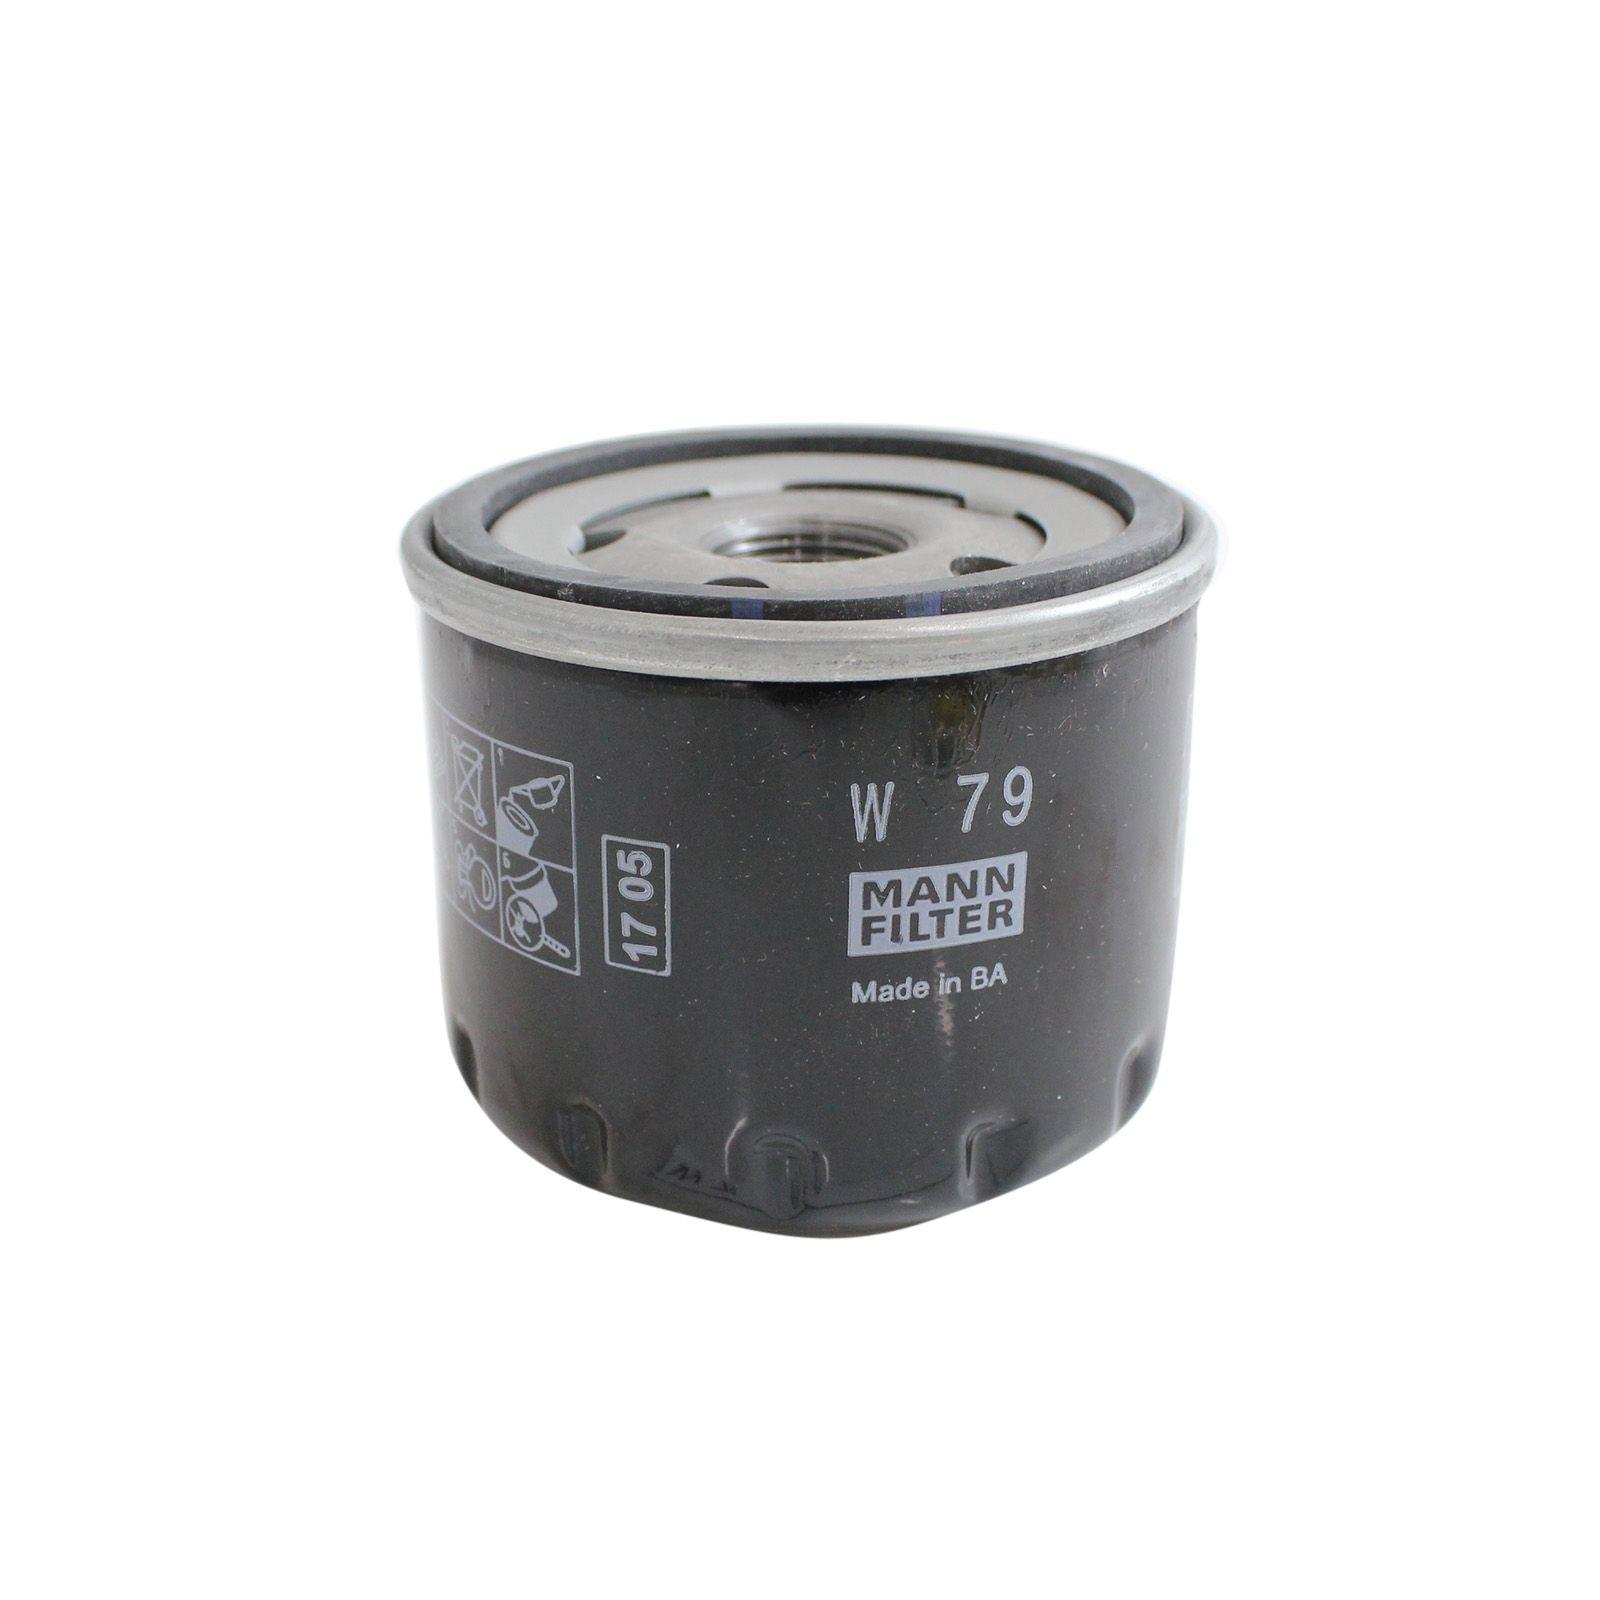 Öl Filter Mann W 79 Mahle OC 471 Hengst H221W Bosch F 026 407 022